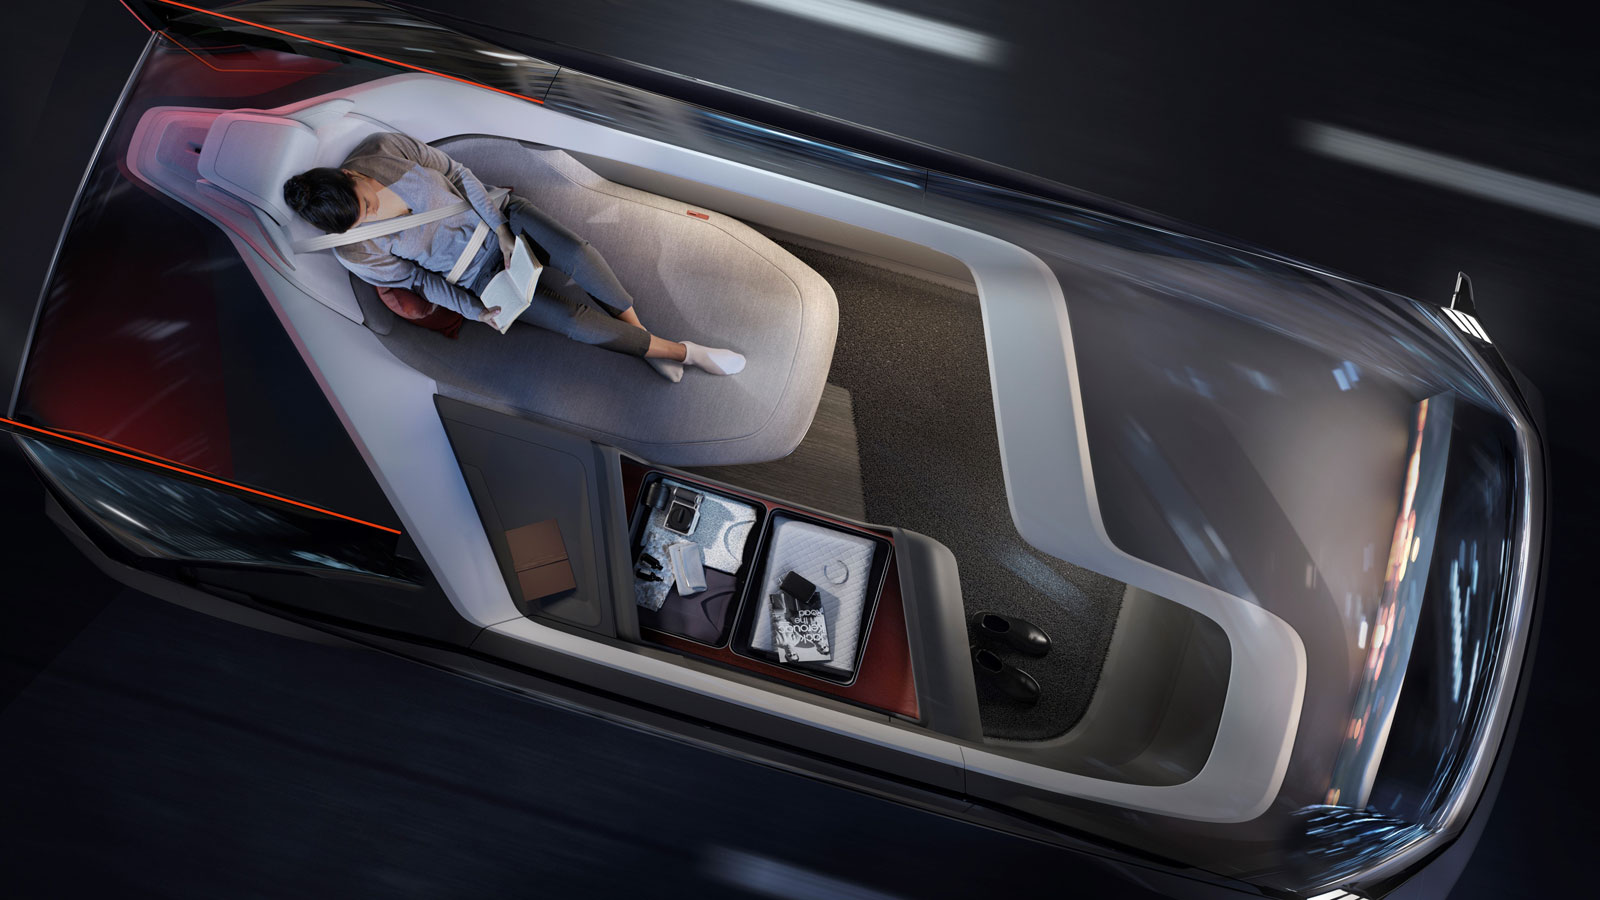 Volvo-360c-Autonomous-Concept-Interior-Sleeping-01.jpg